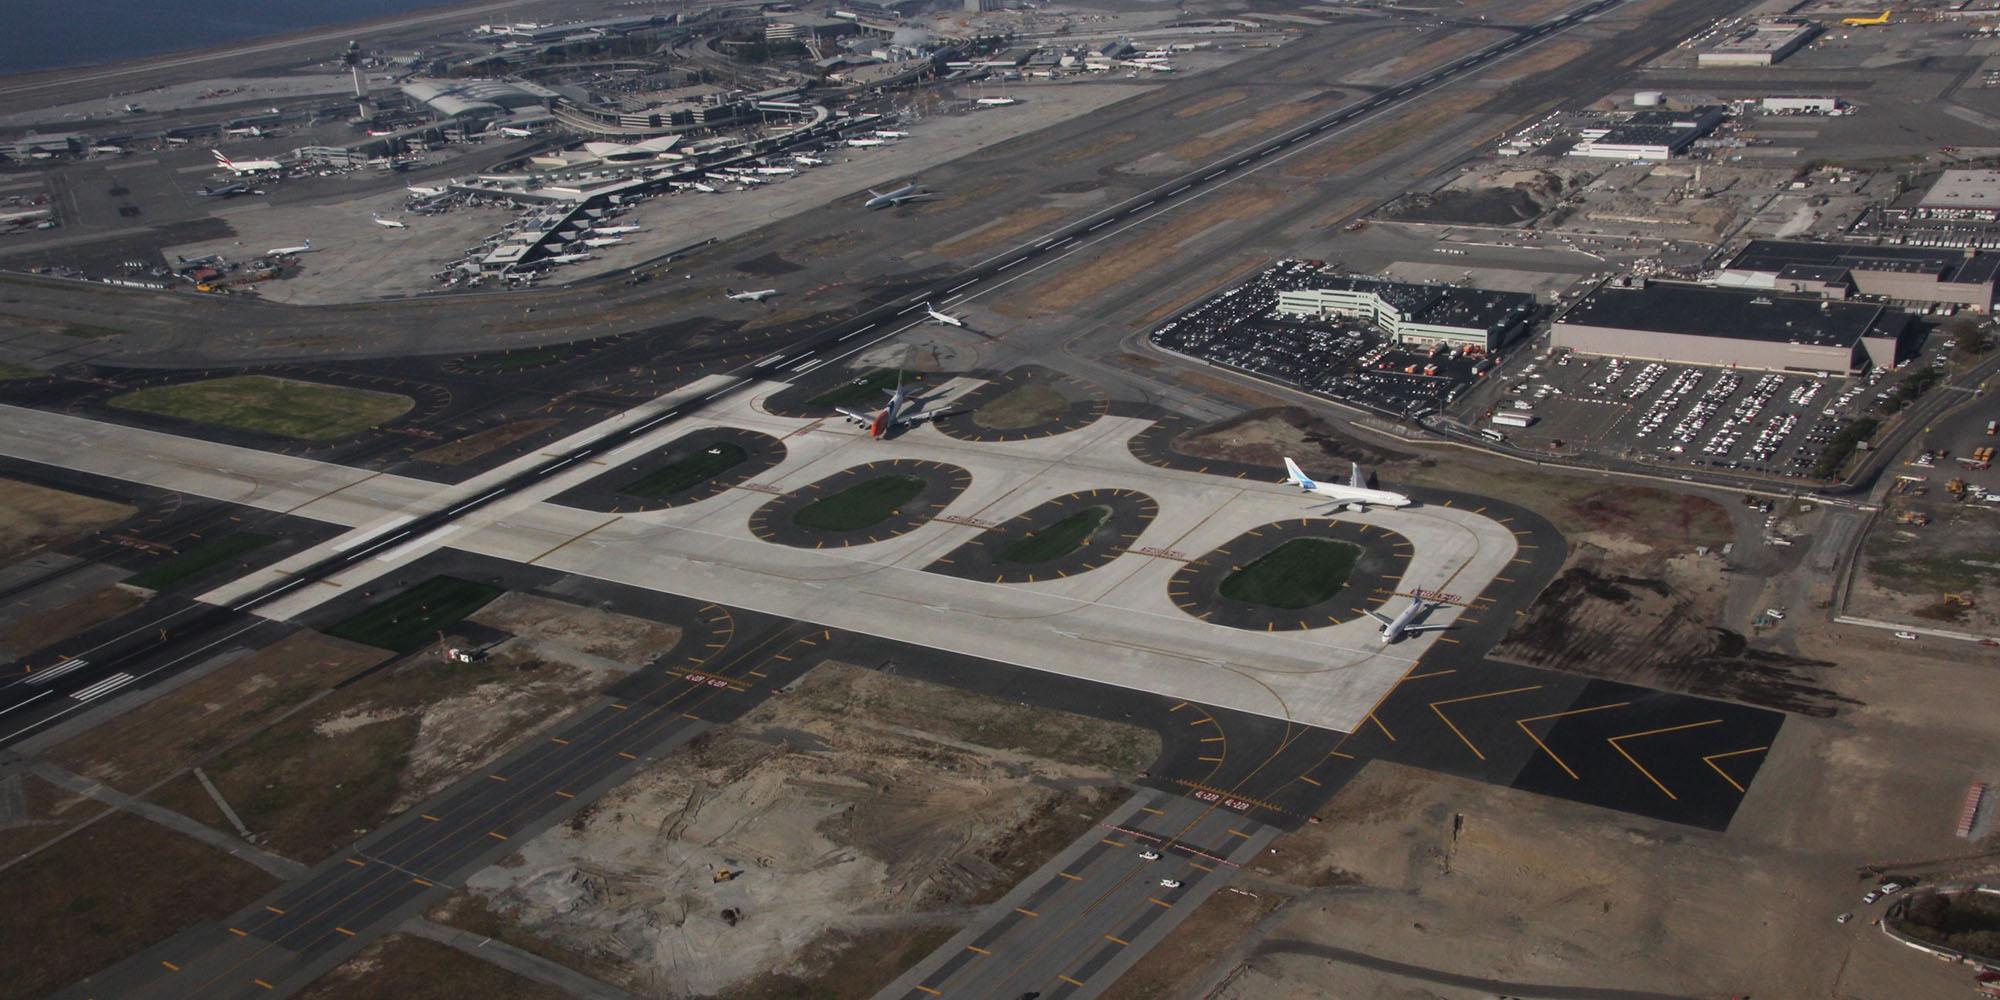 Jfk Airport Expansion